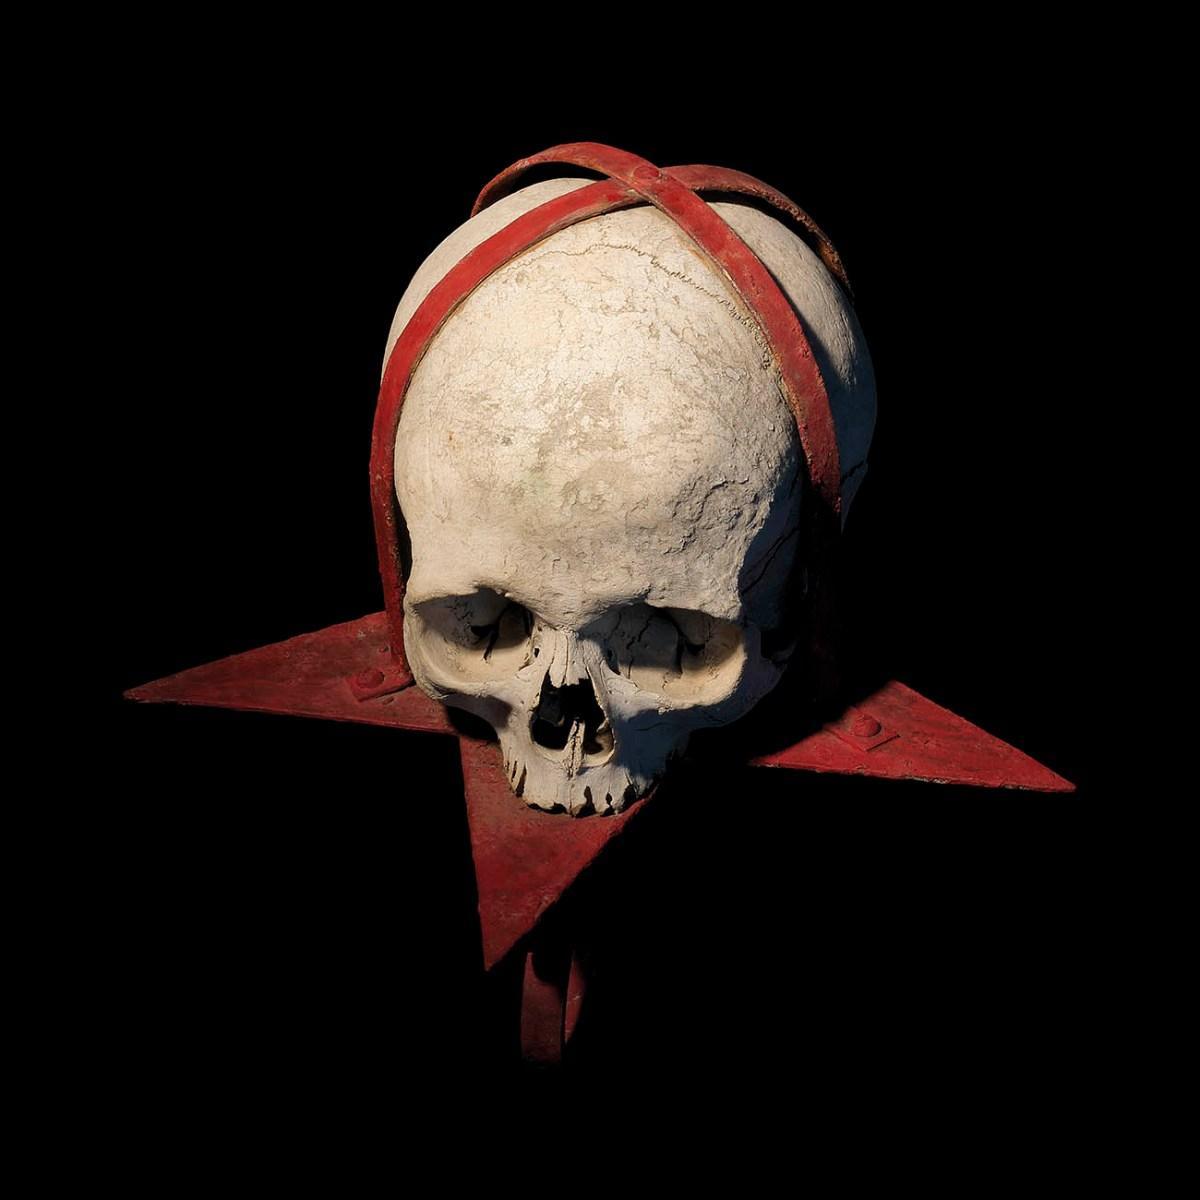 https://i1.wp.com/www.sarahannant.com/wp-content/uploads/2015/08/Skull-used-for-Ritual-Magic.jpg?fit=1200%2C1200&ssl=1